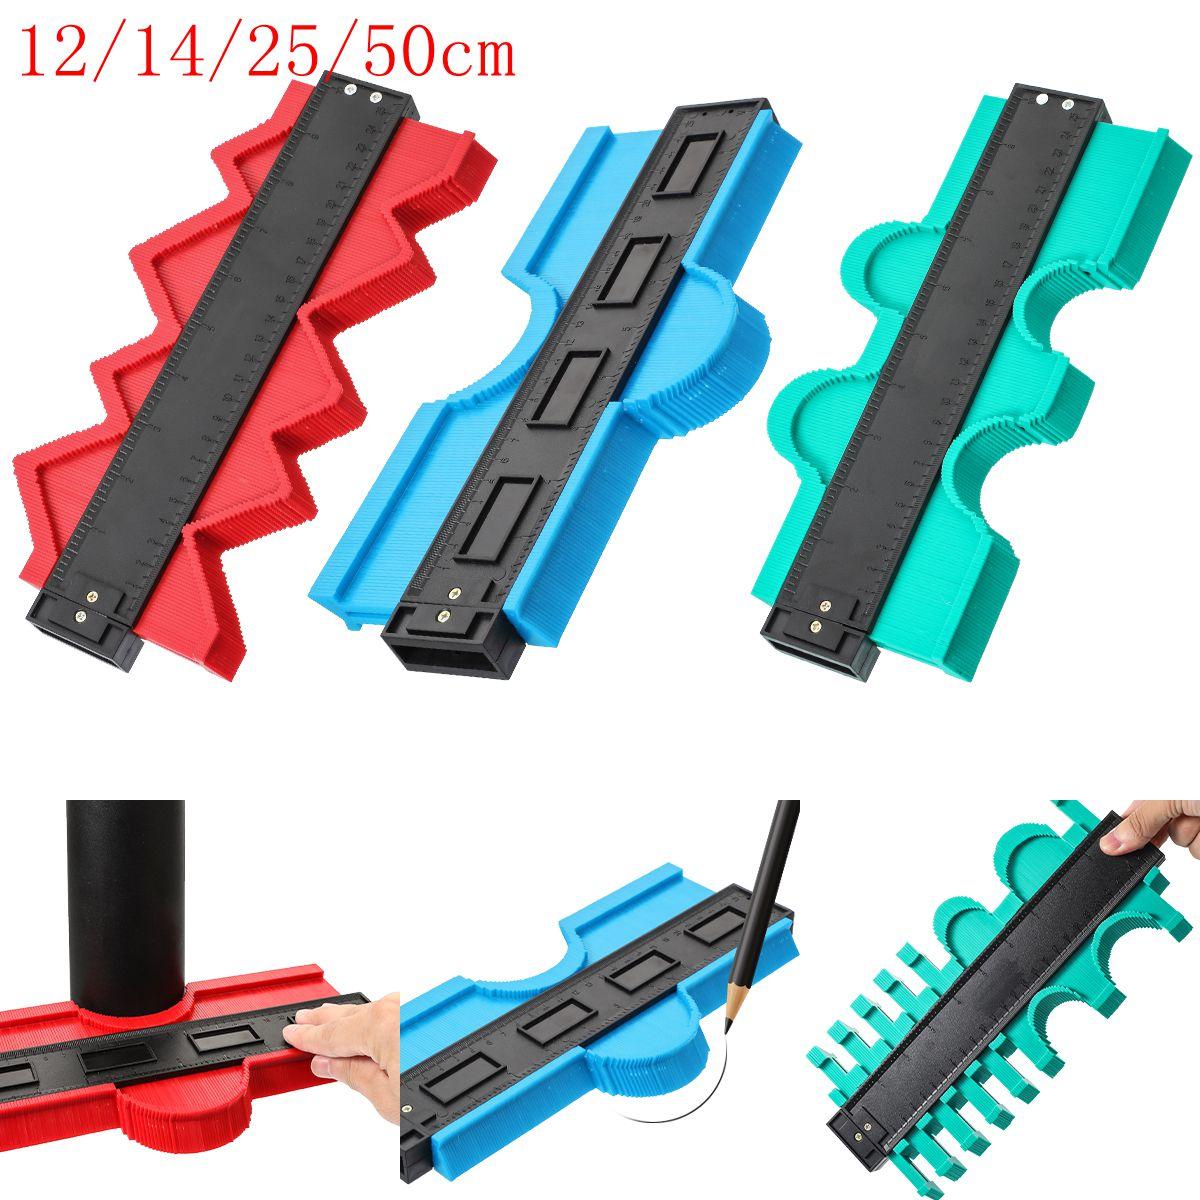 12/14/25/50cm  Contour Gauge Plastic Profile Copy Shape Contour Gauge Meter Duplicator Standard Wood Marking Flooring Tools